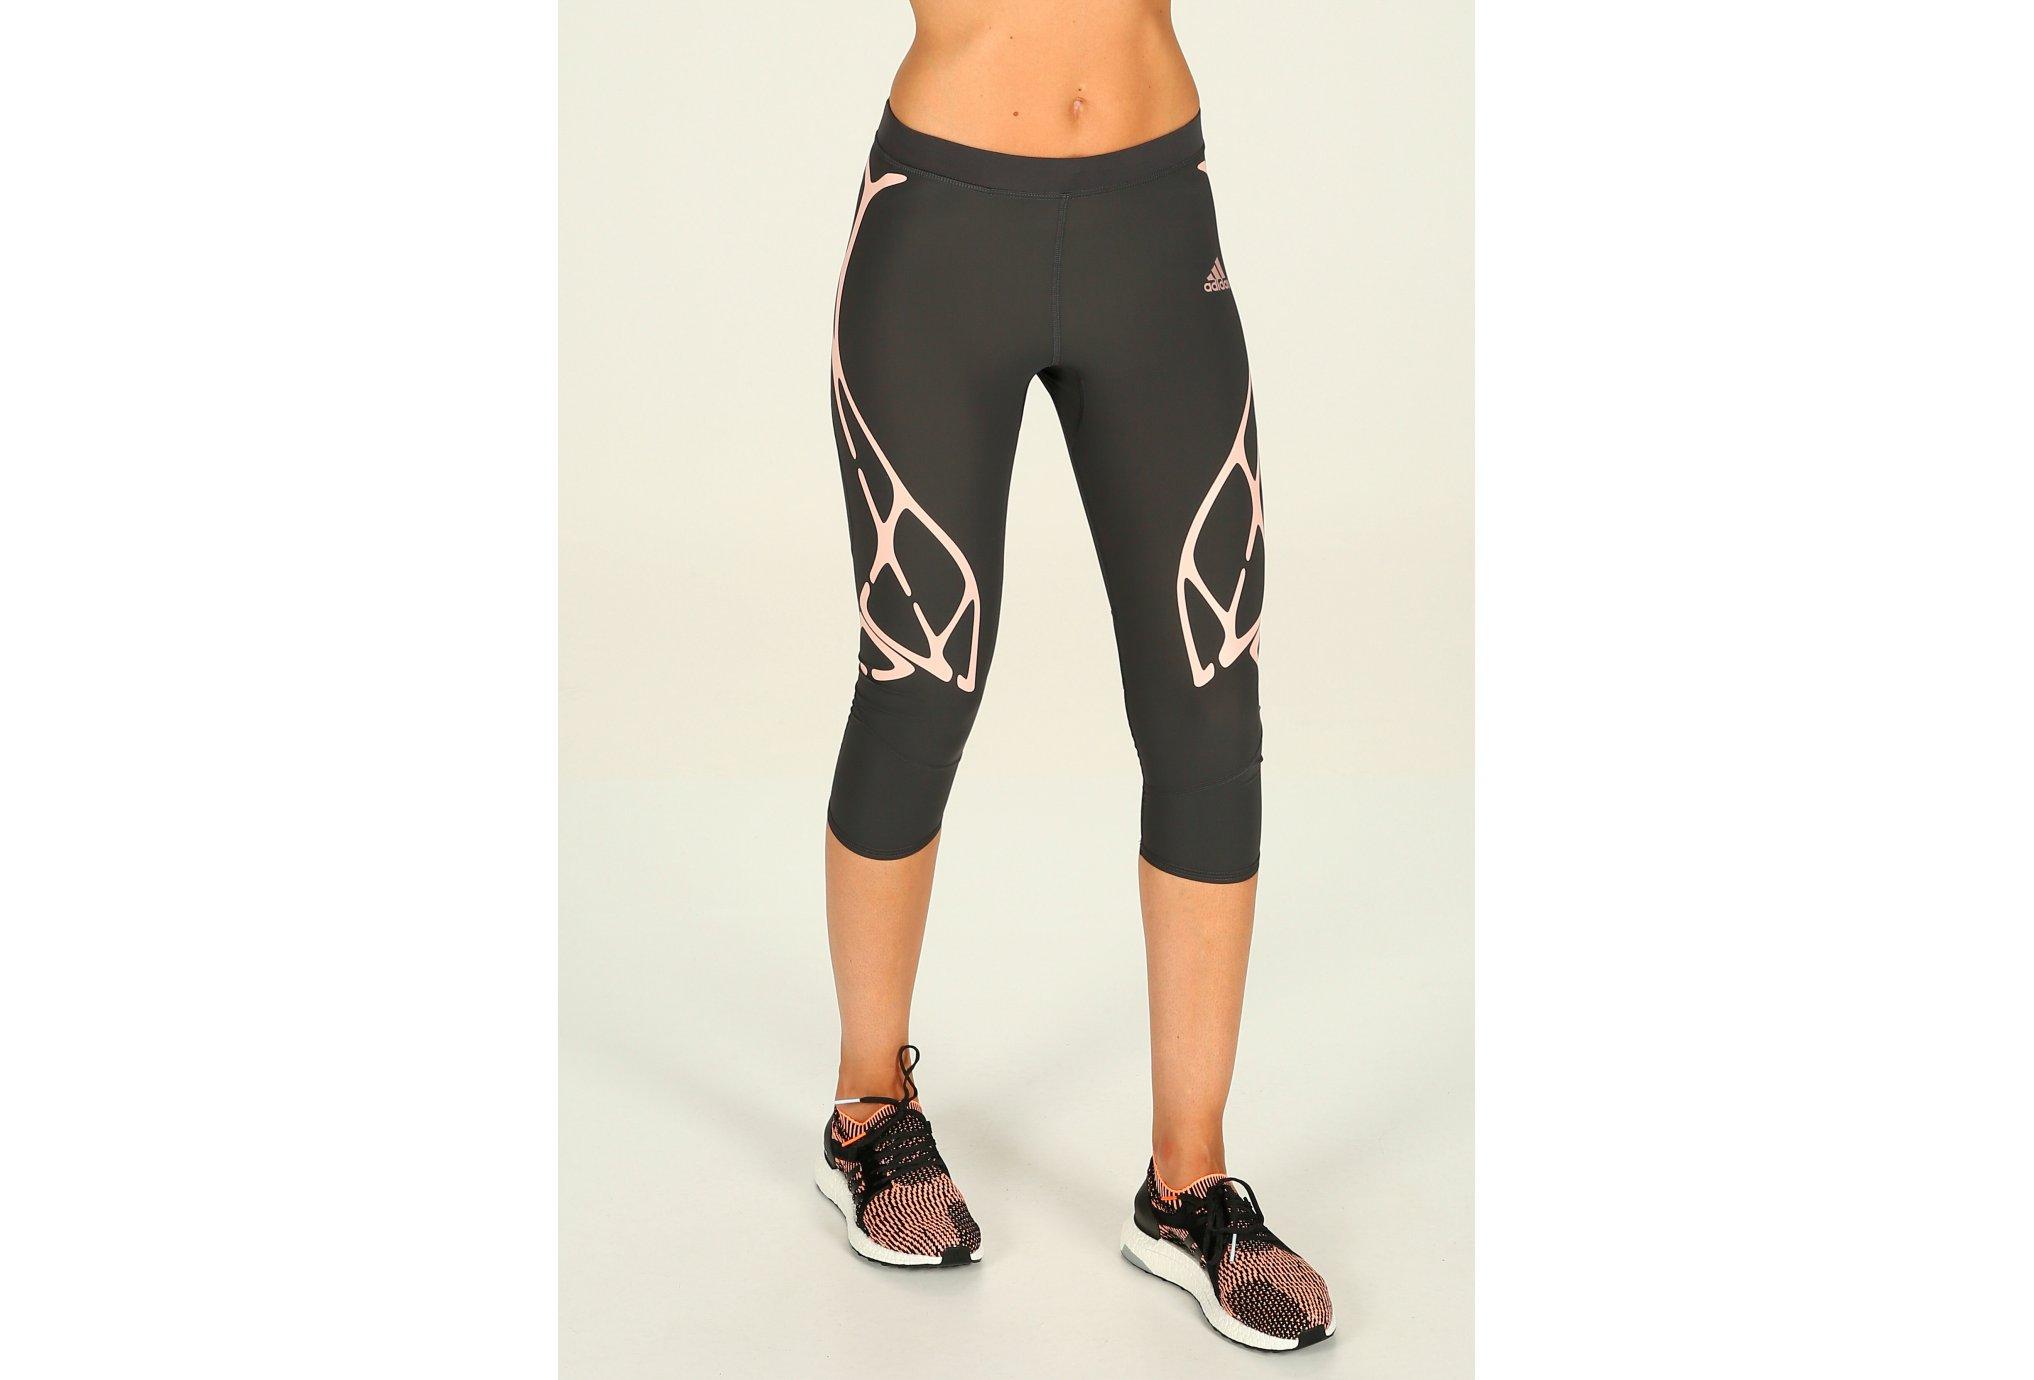 Adidas Corsaire adizero sprintweb w vêtement running femme